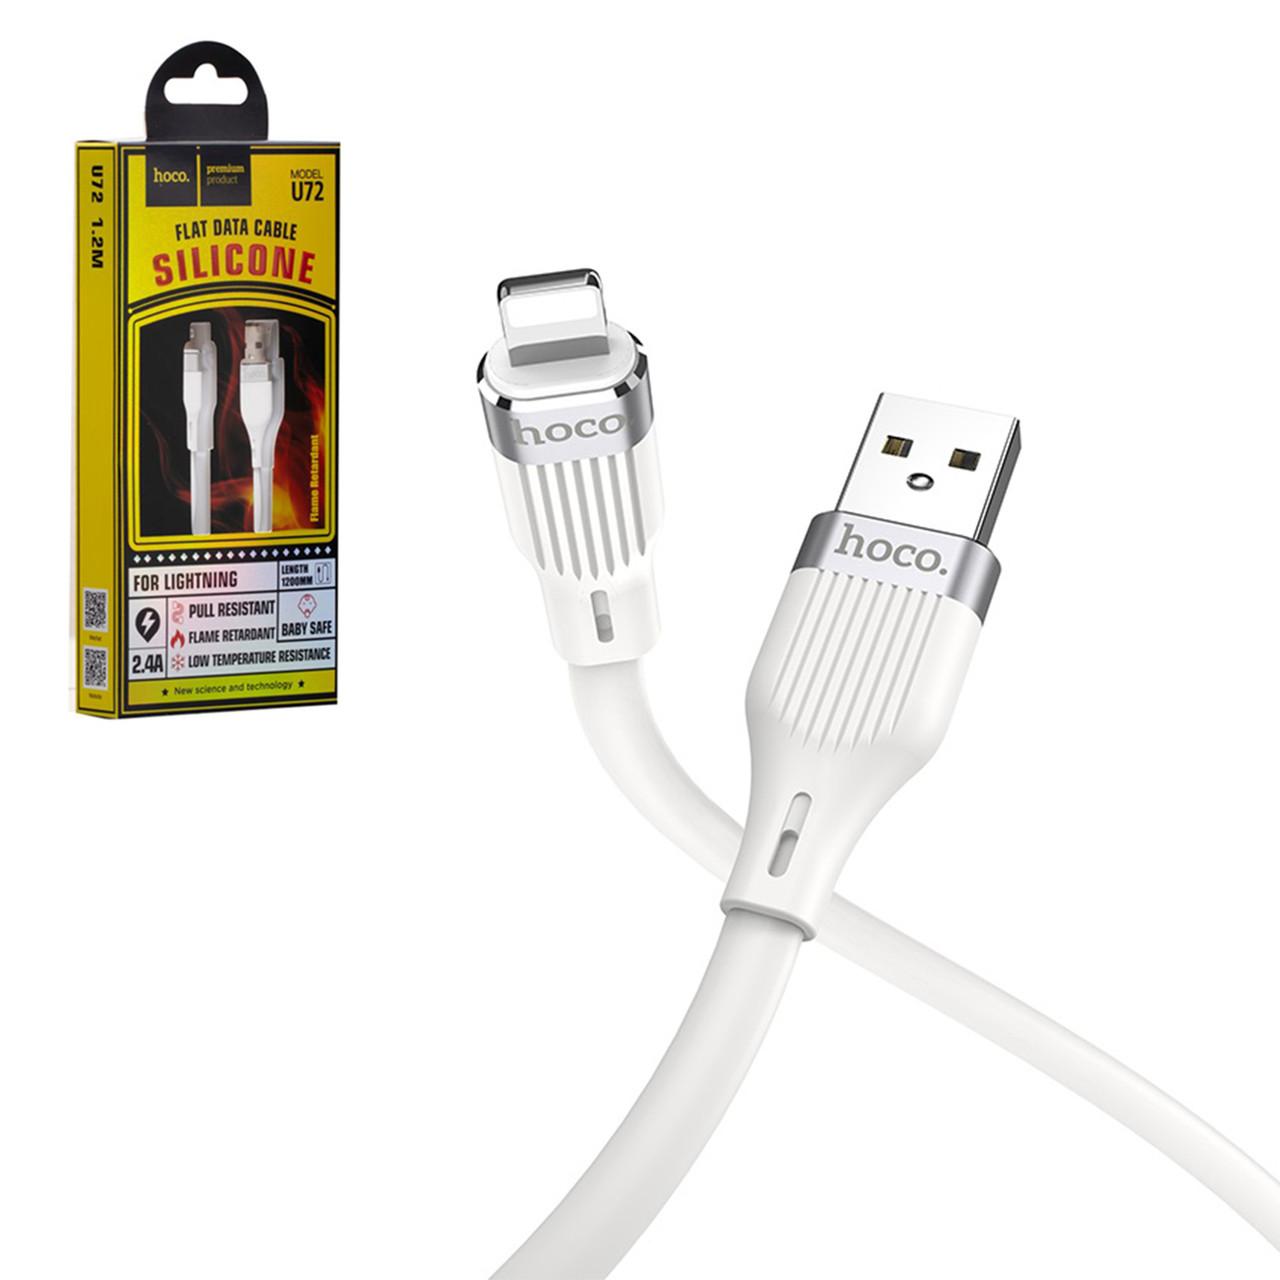 Кабель Apple lightning Hoco U72 Forest Silicone 1.2m, White